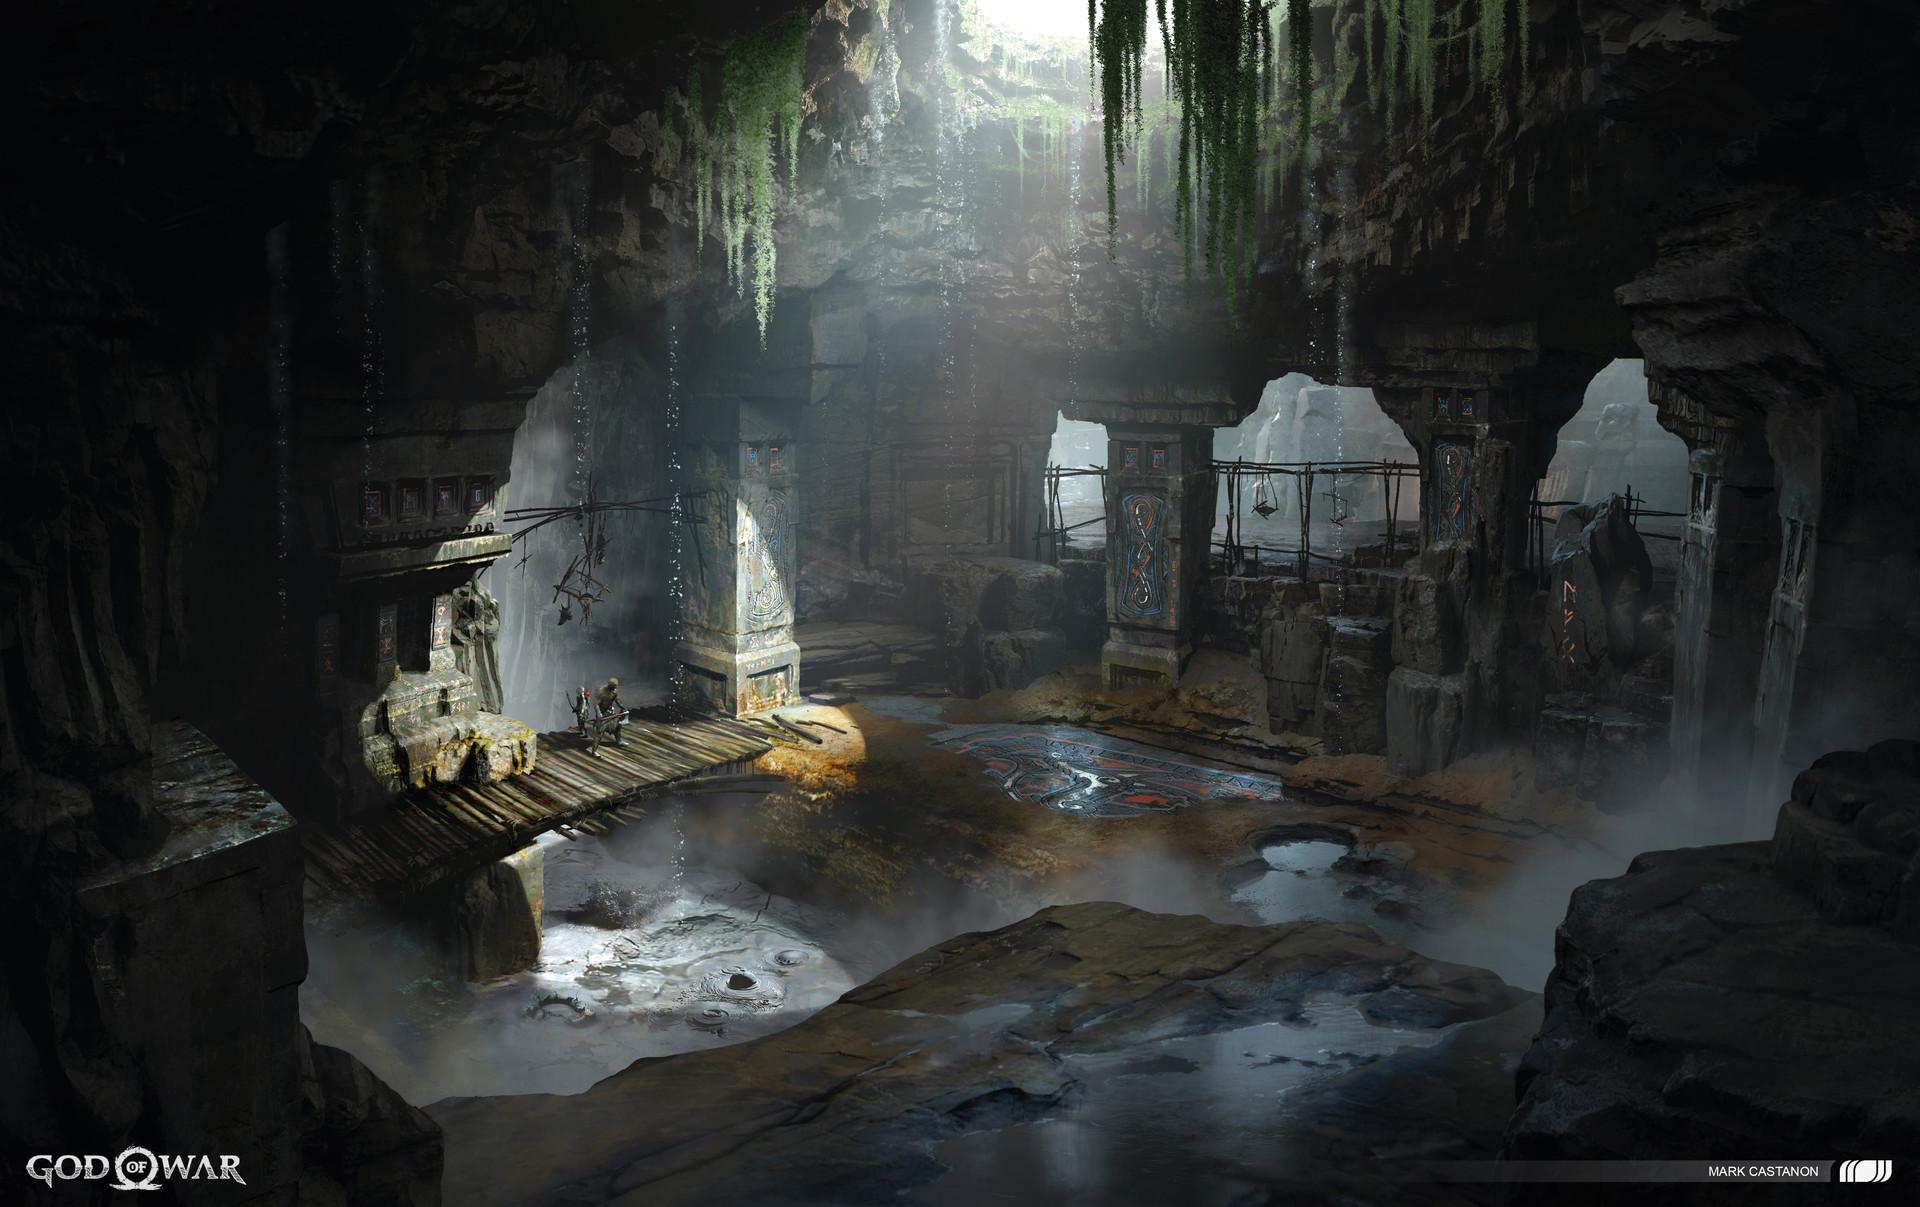 mark-castanon-aogwar-dangersoftheworld-cave-mc-001.jpg